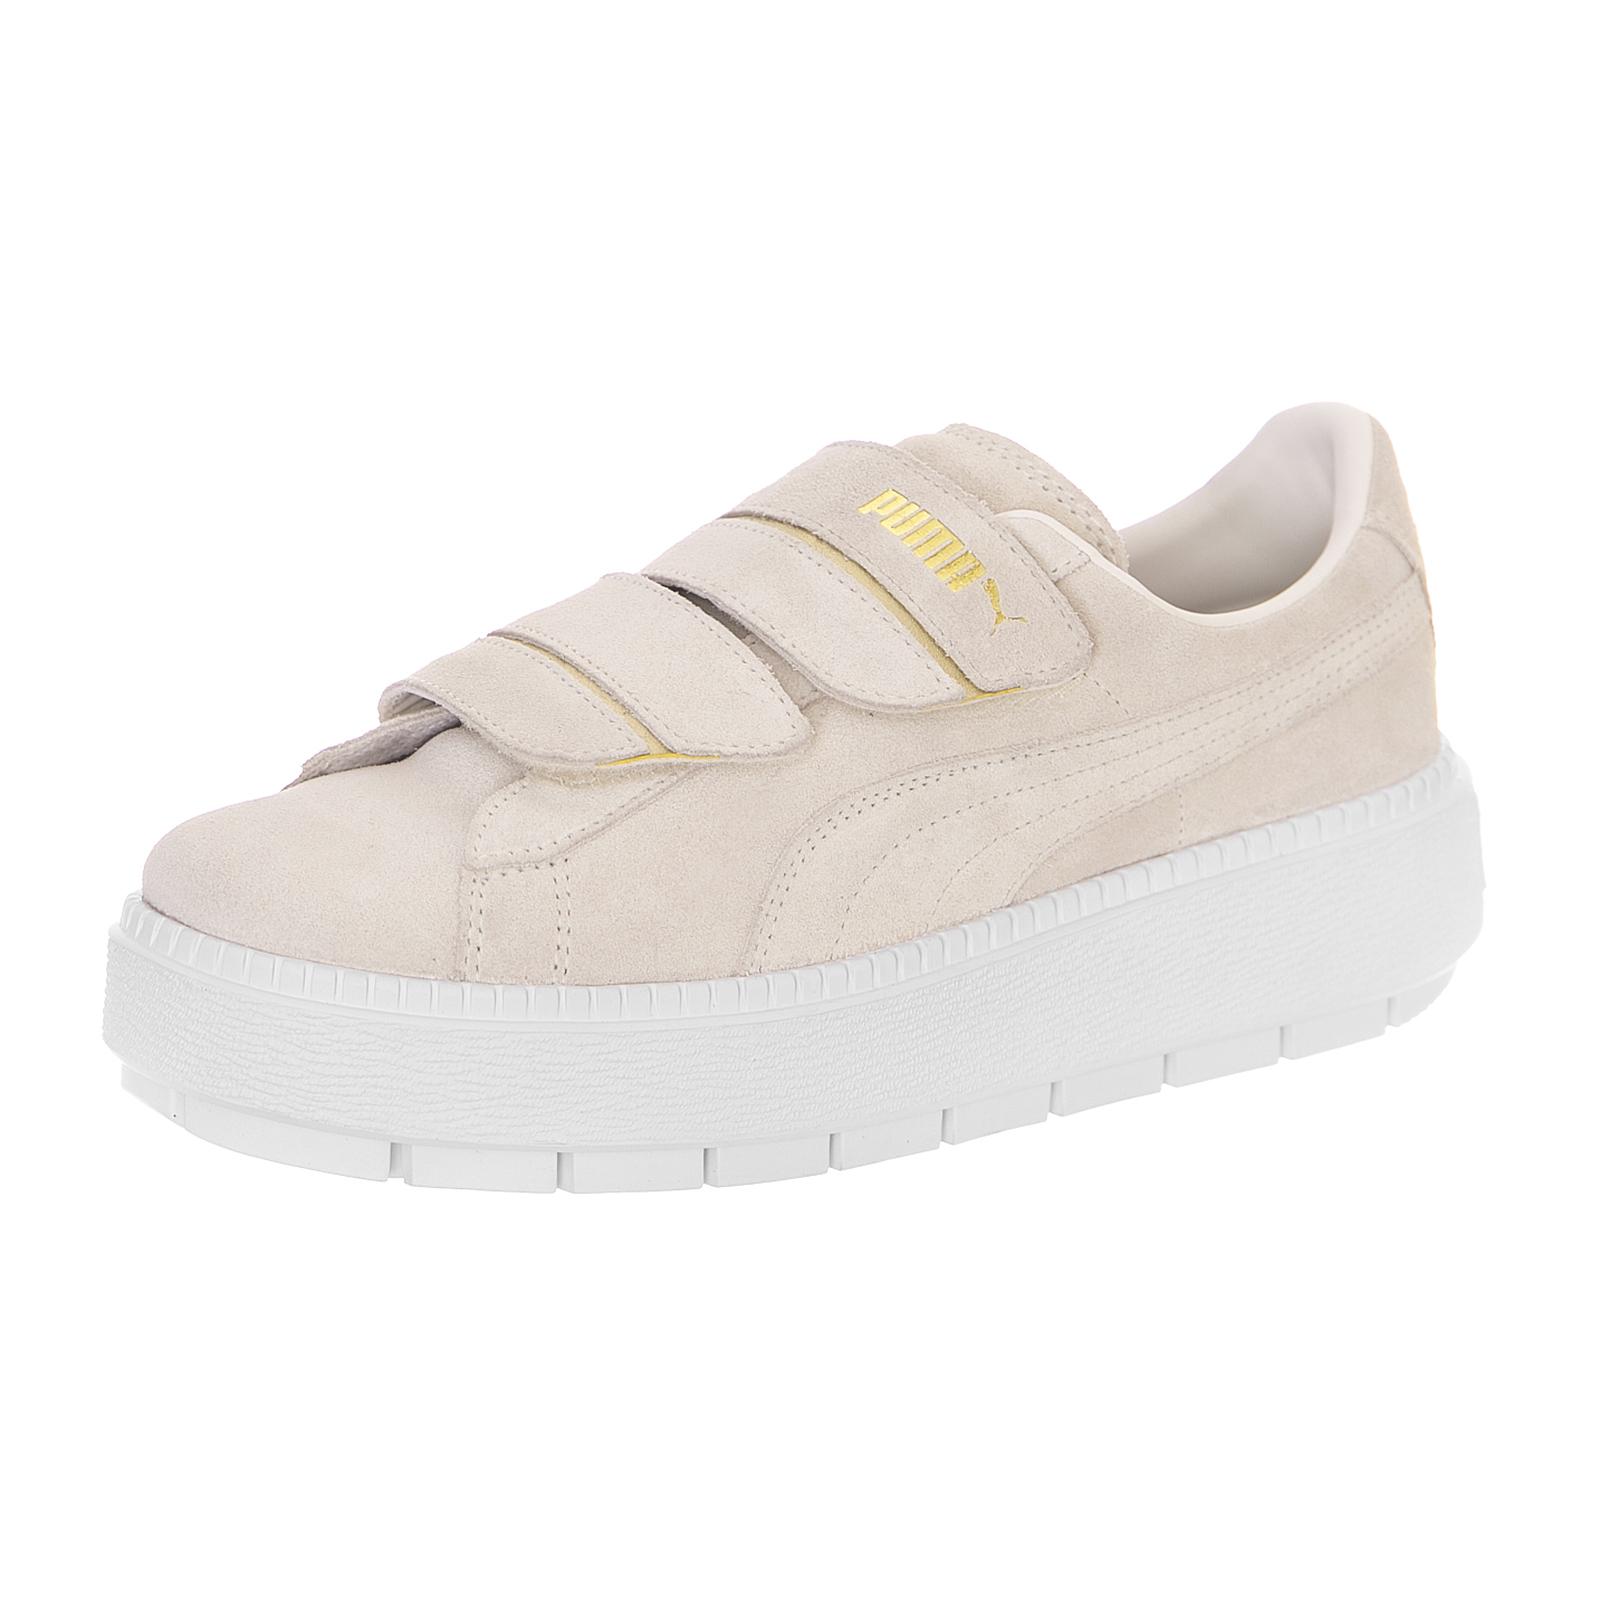 Puma Sneakers Platform Trace Strap Bianco Wn S Whisper White Bianco Strap 707d25